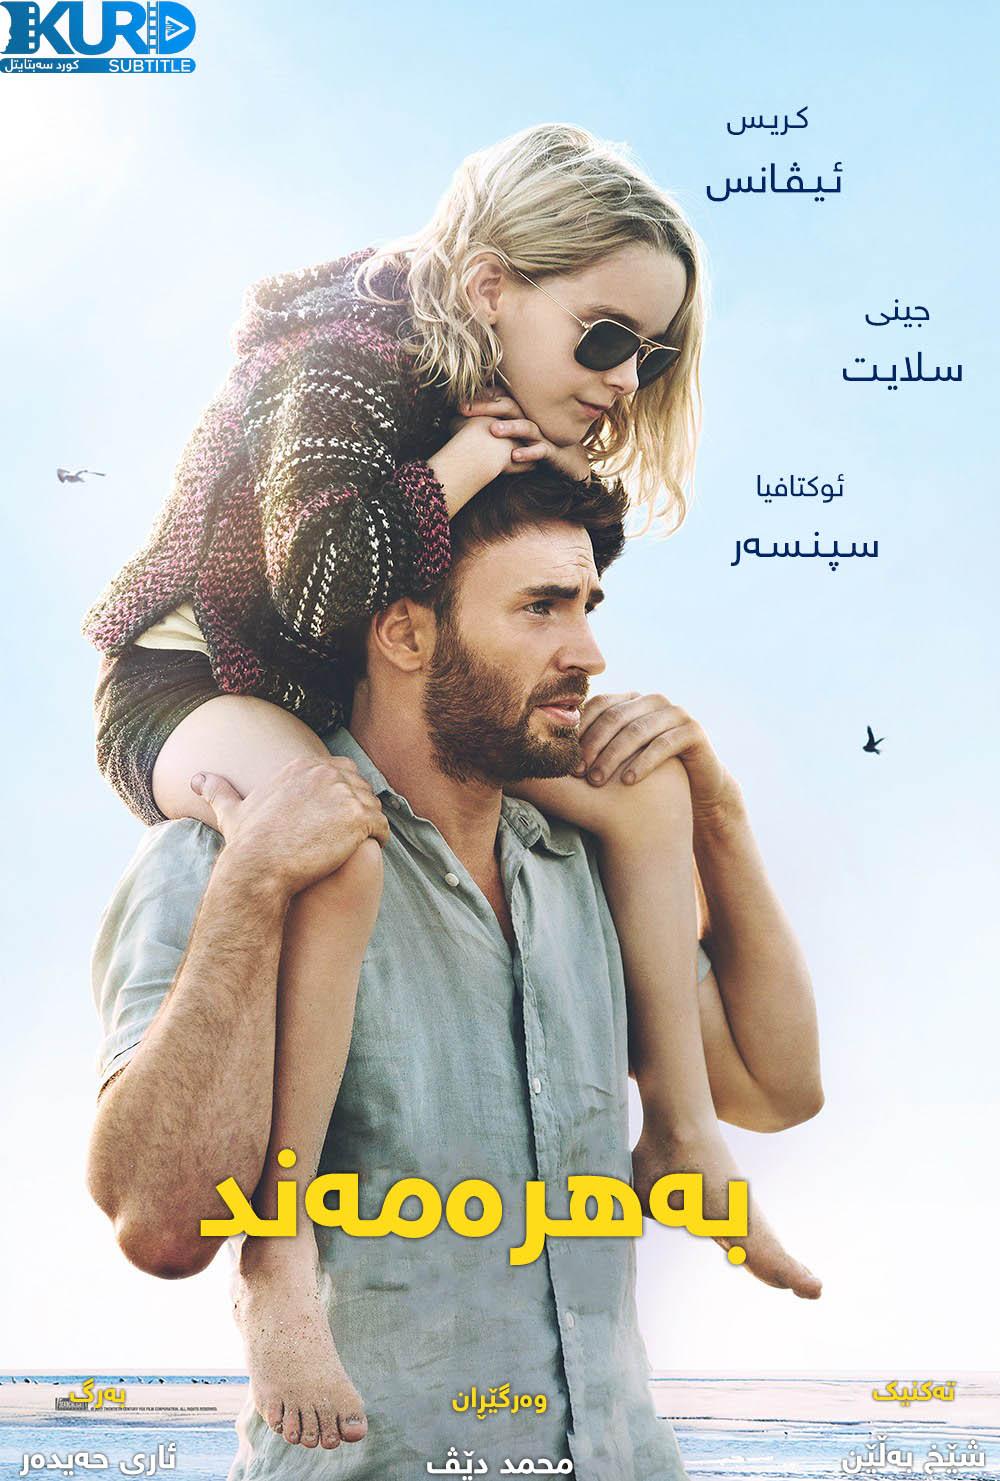 Gifted kurdish poster